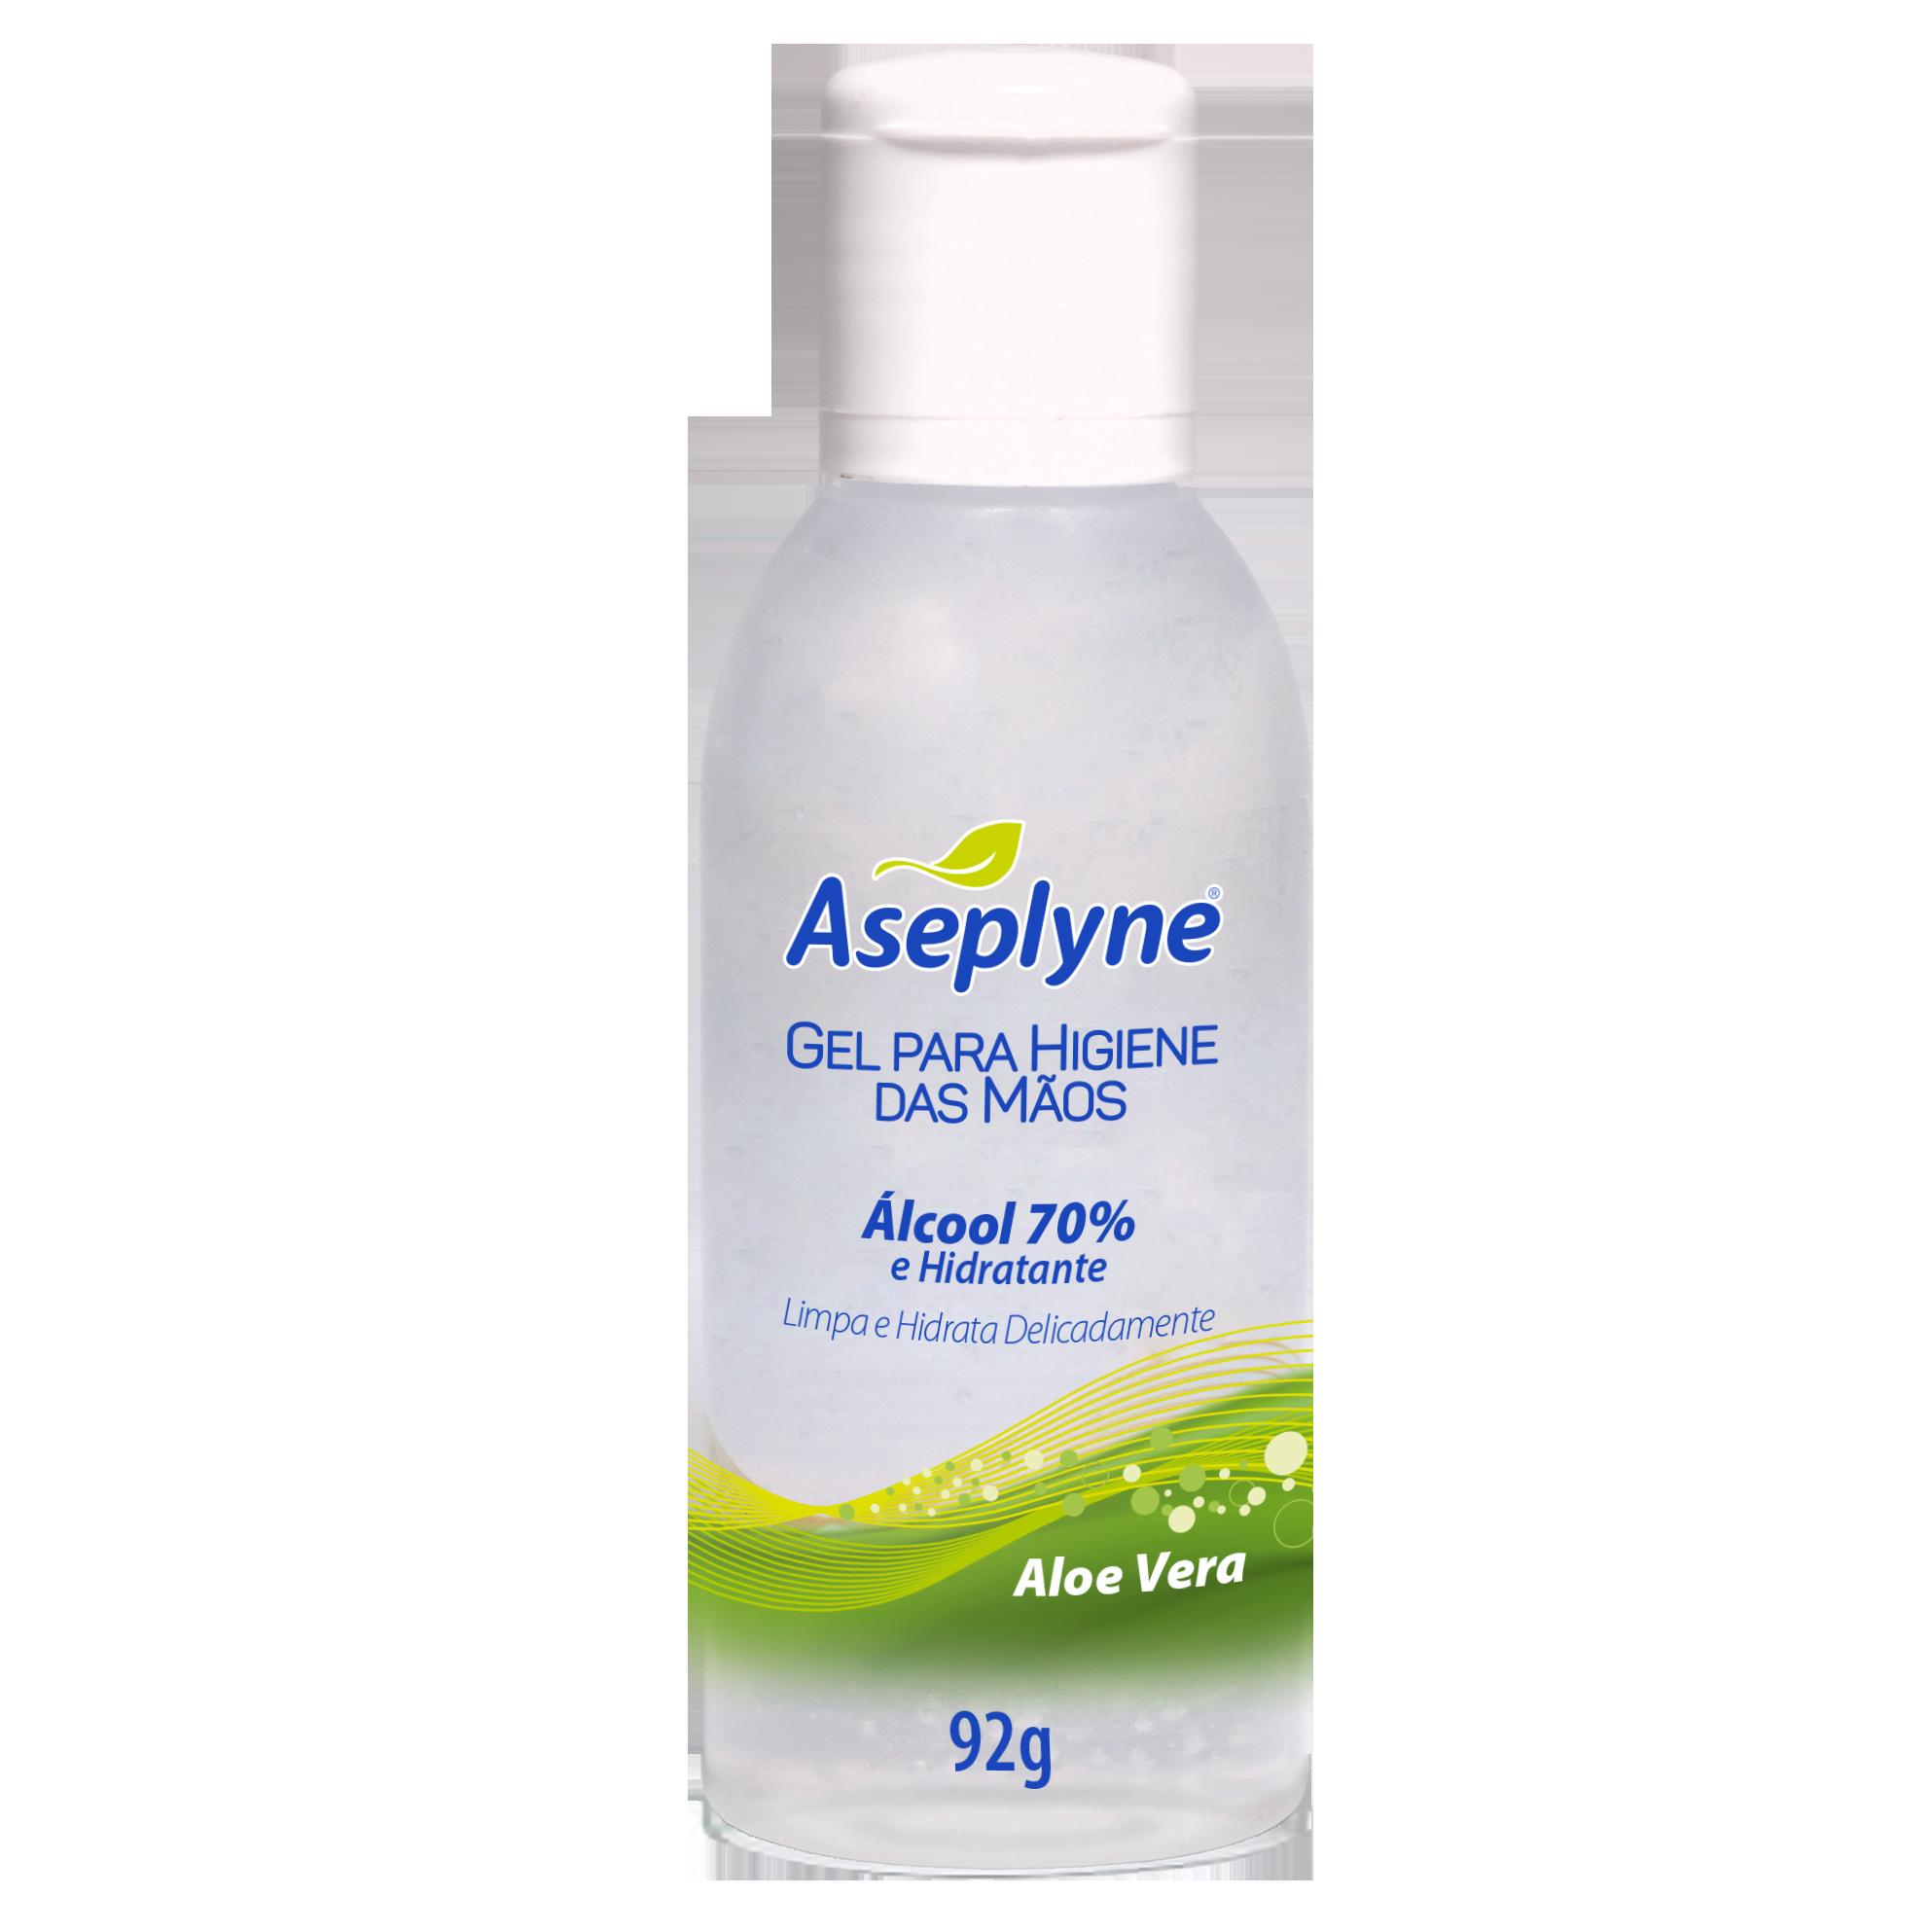 Gel Higiene Mãos Aseplyne Aloe Vera 92g